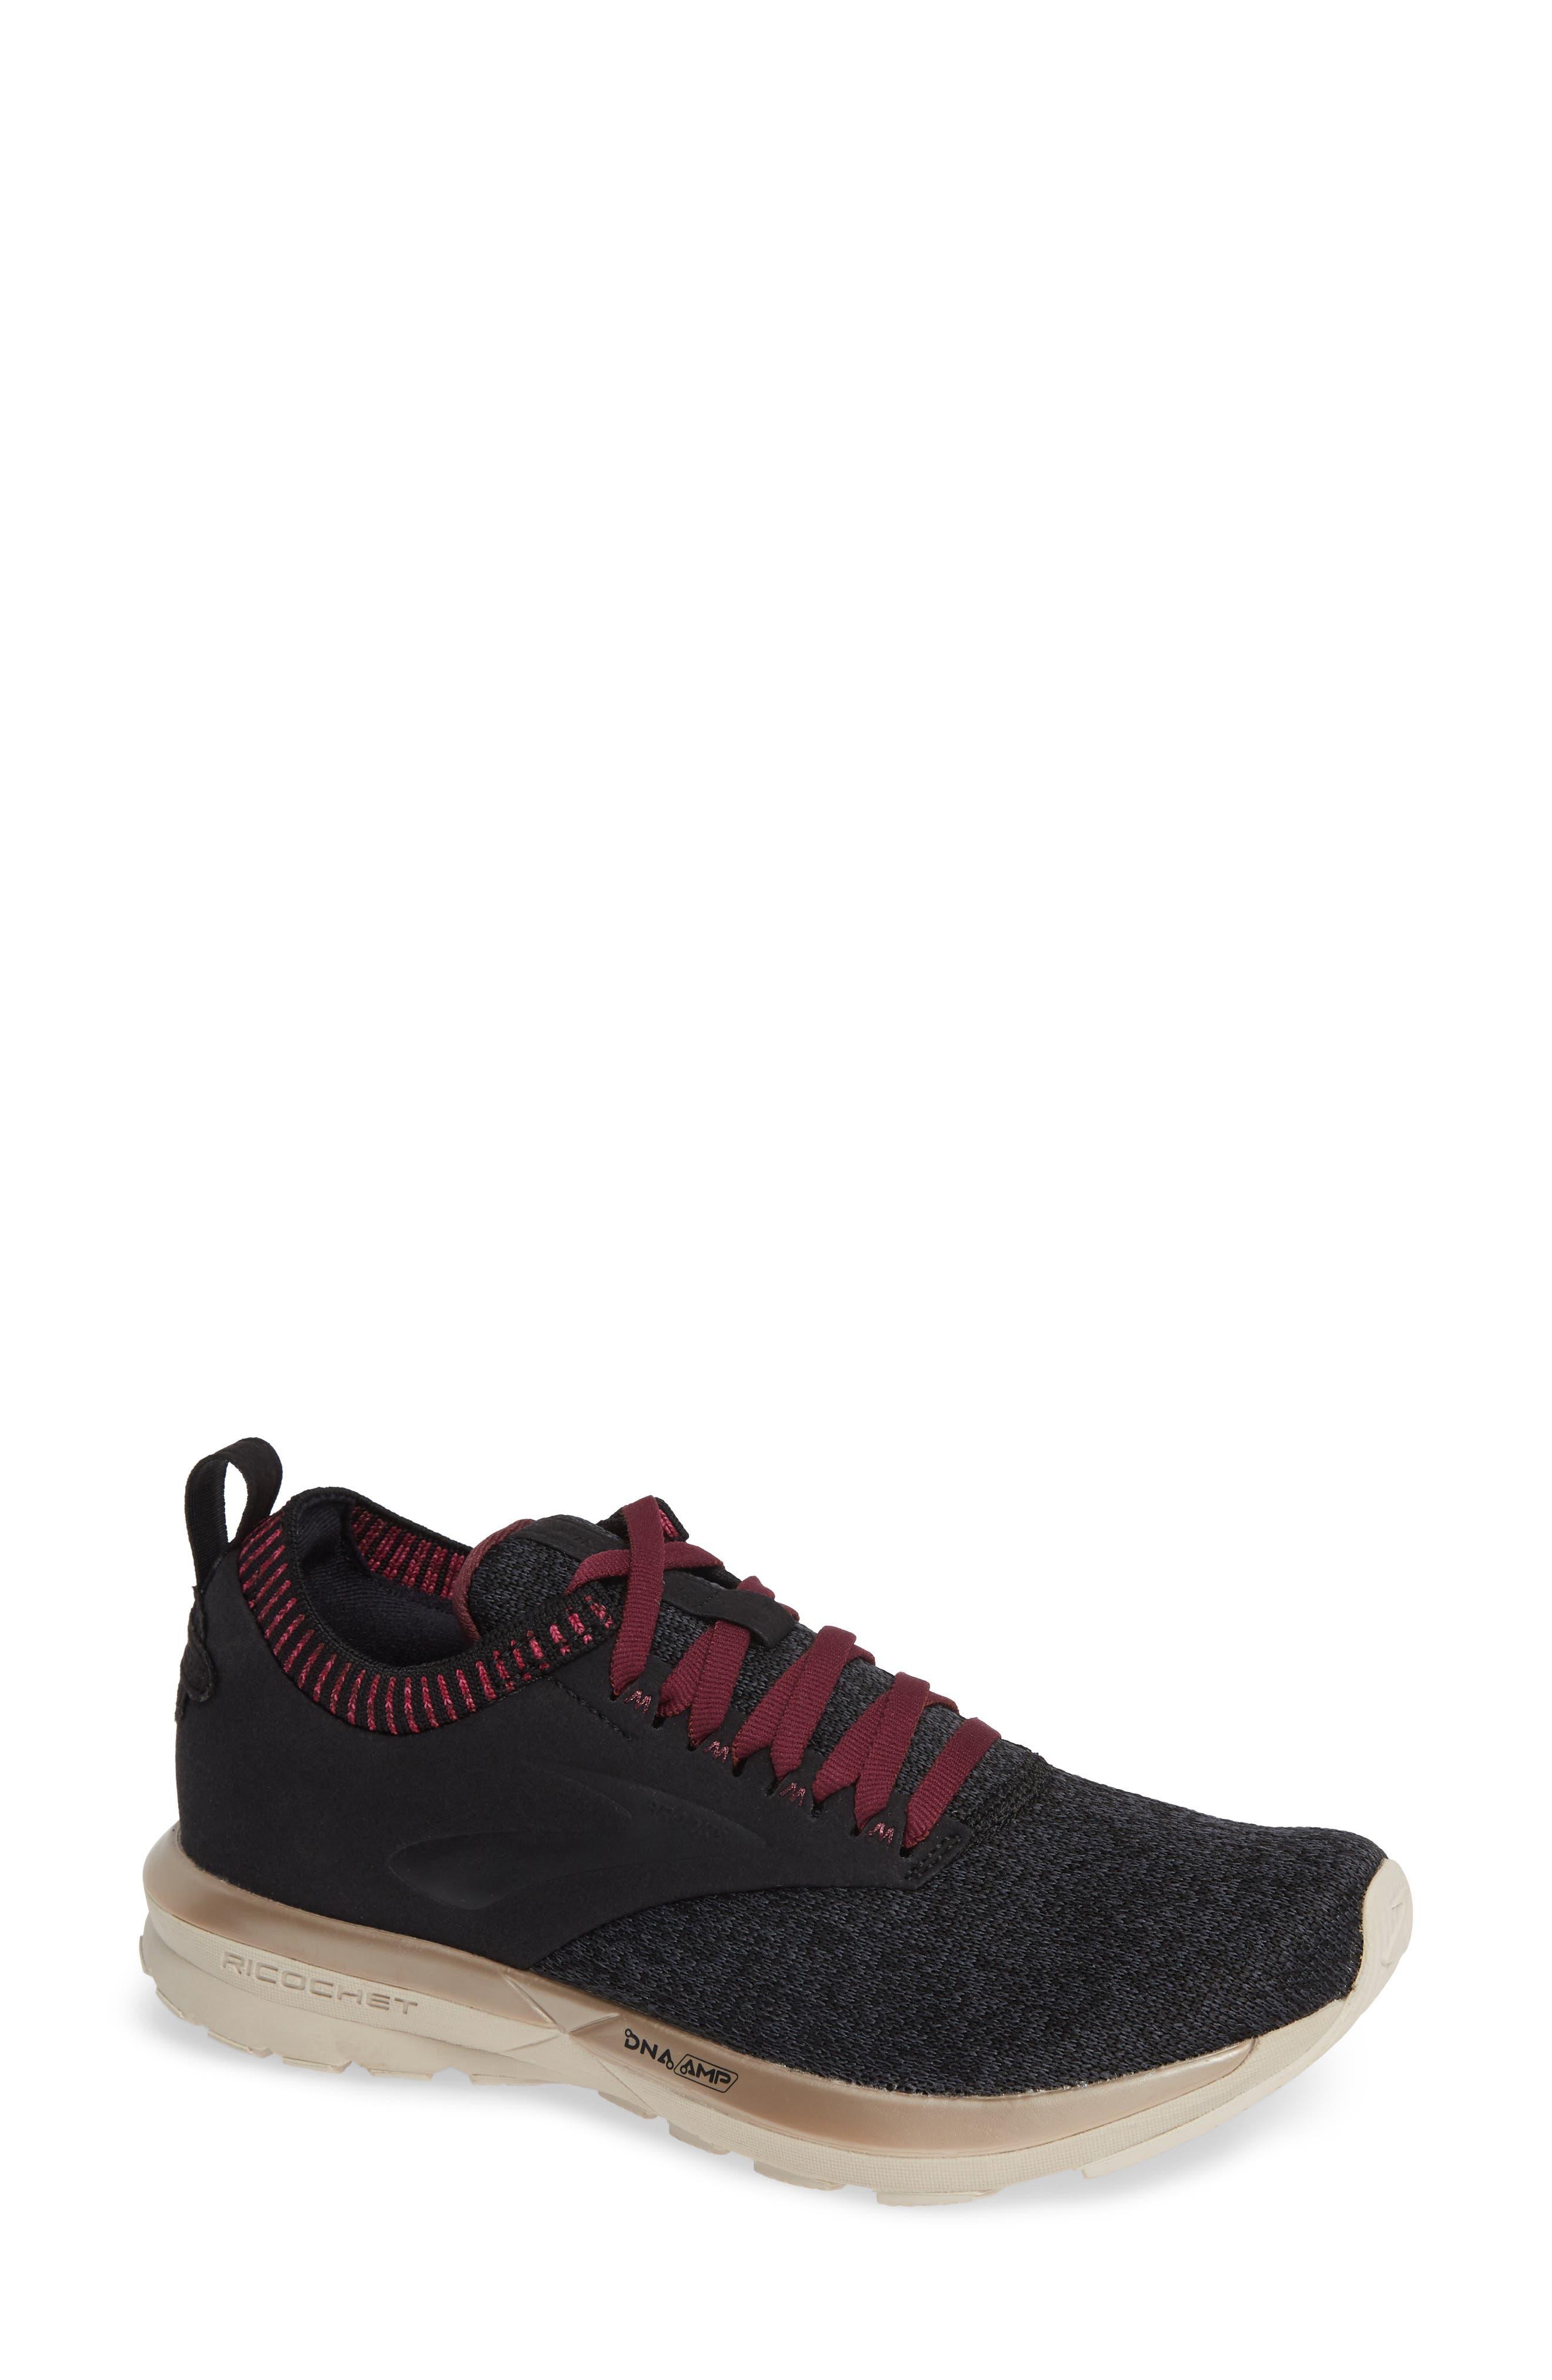 Ricochet LE Running Shoe, Main, color, BLACK/ GREY/ PINK